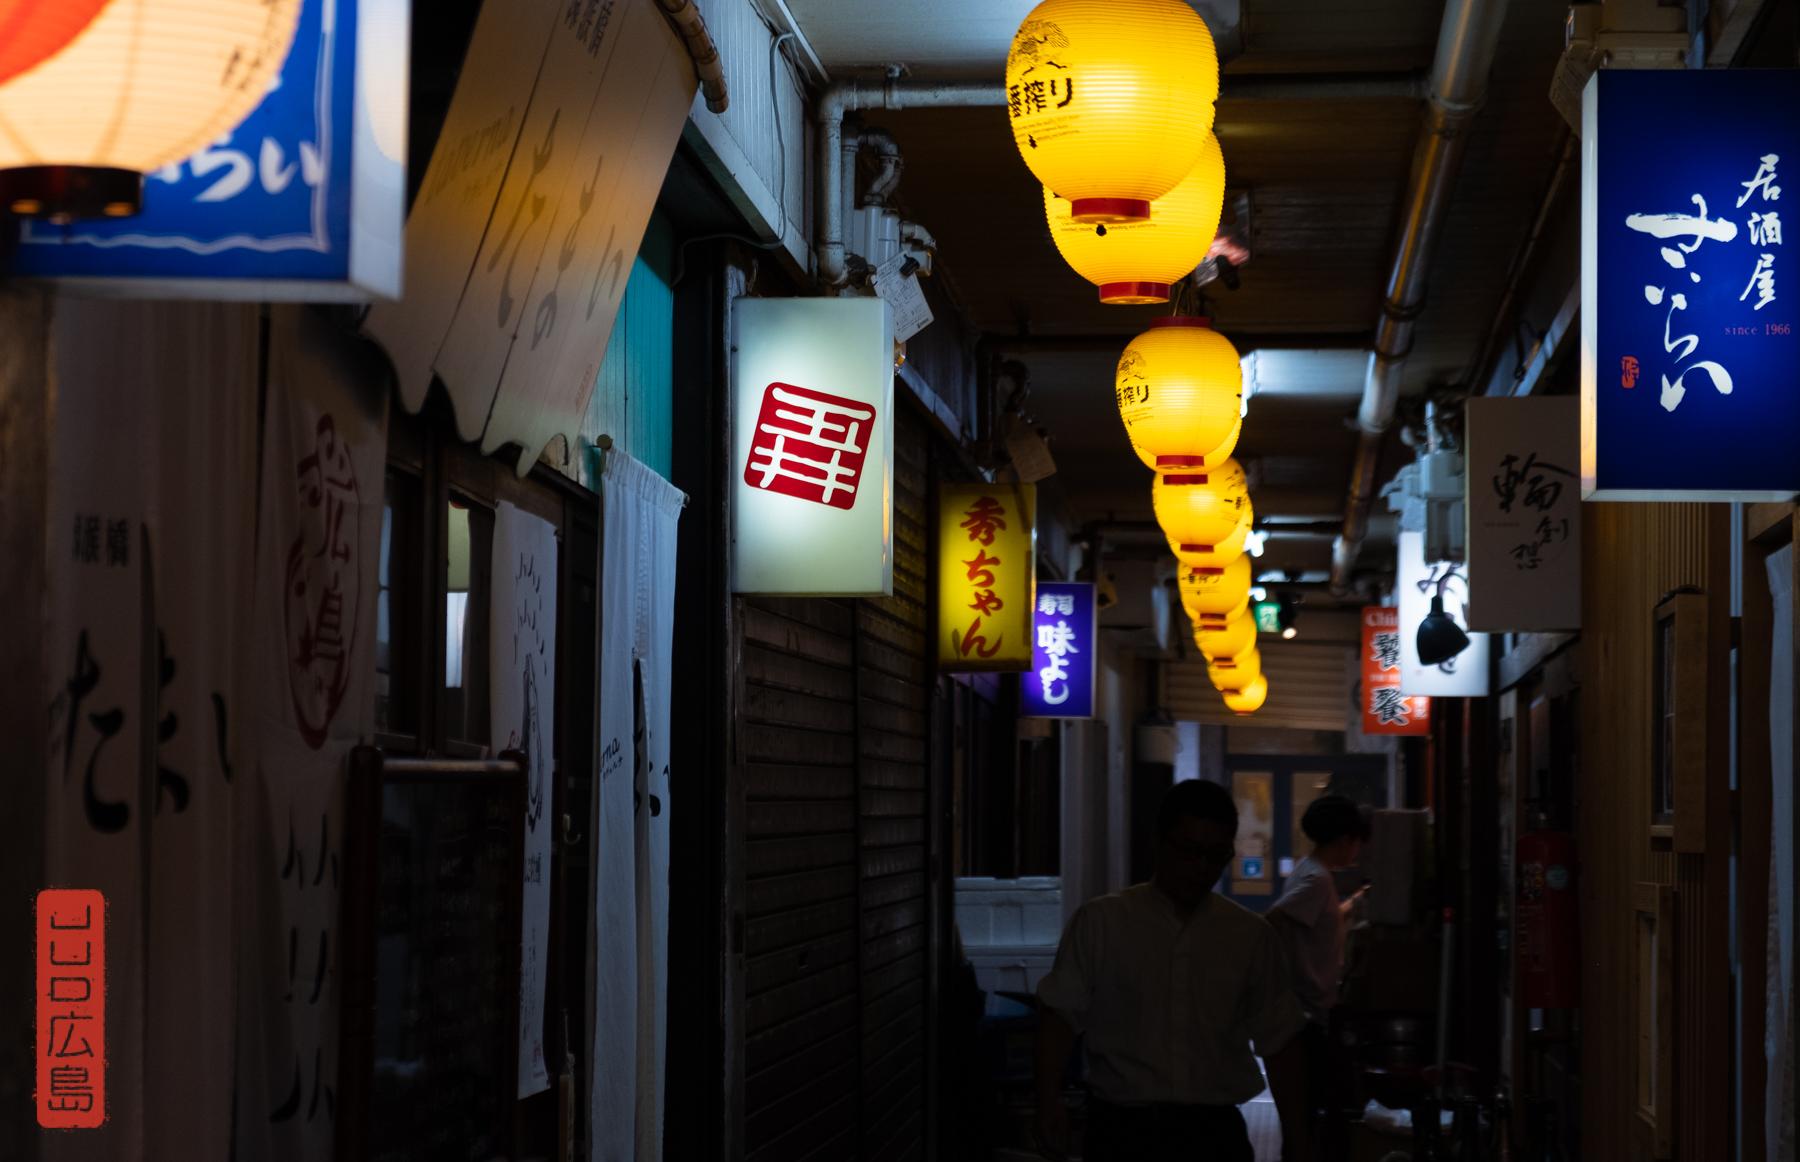 Silhouettes - Hiroshima Enkobashi yokocho